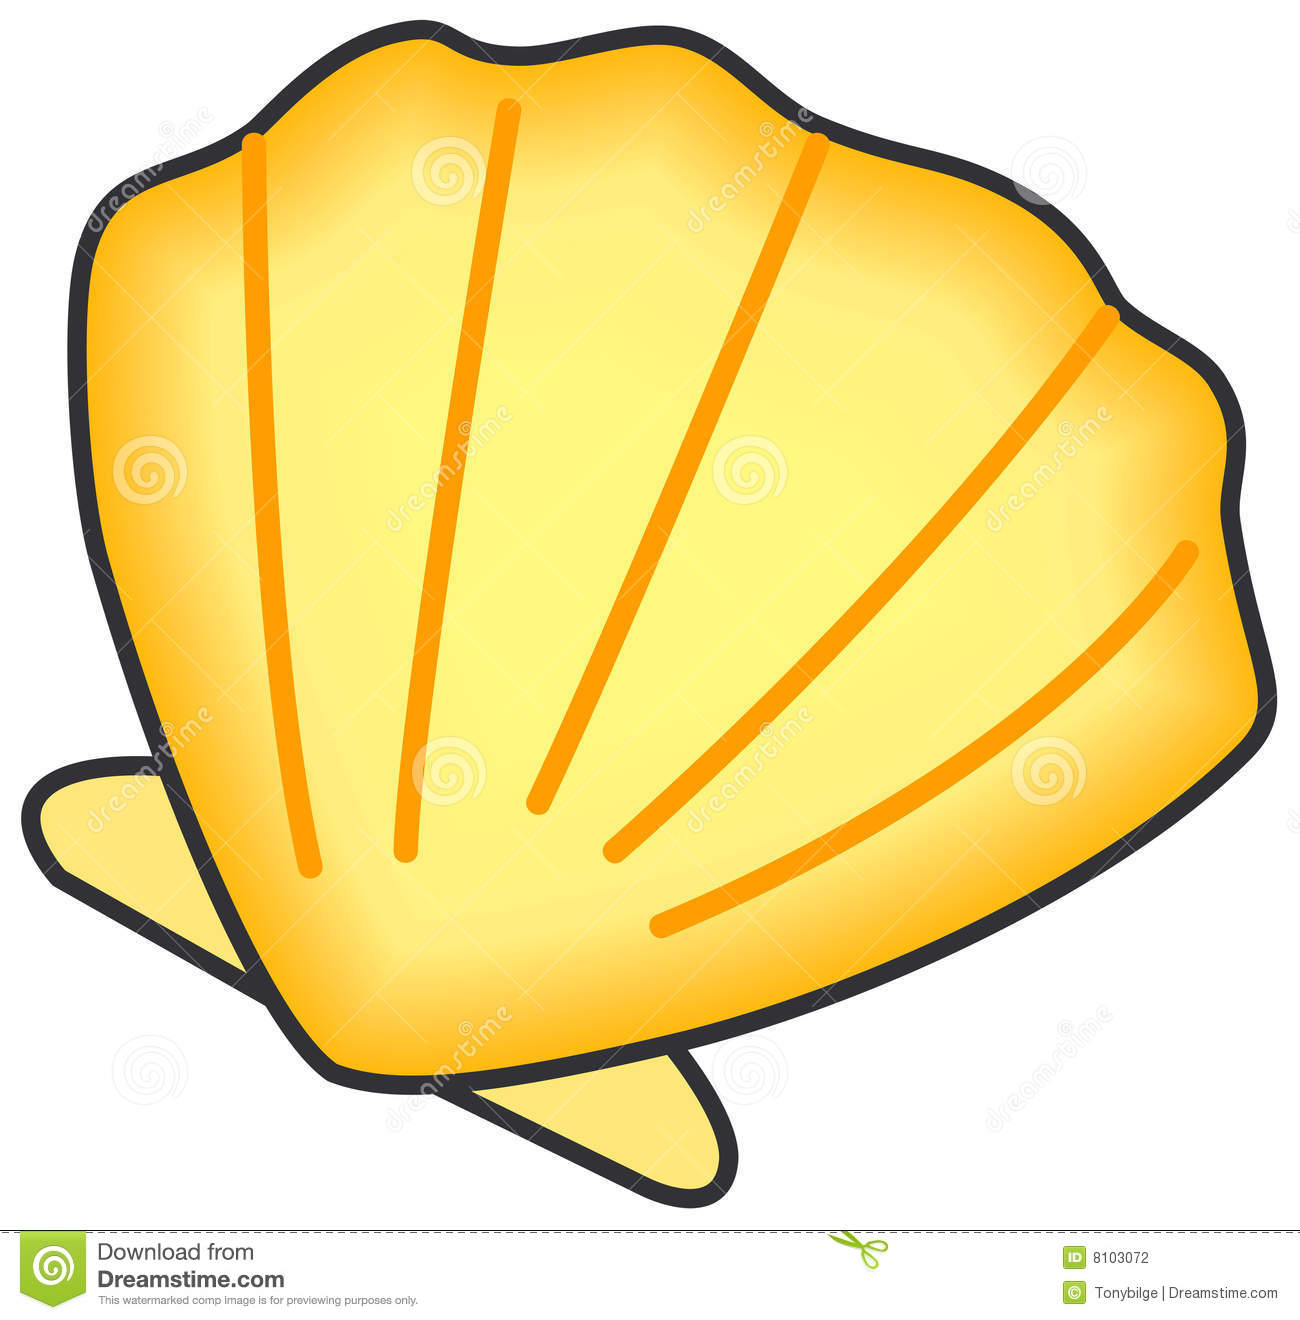 Animated Pictures Of Seashells seashells clipart yellow, seashells yellow transparent free